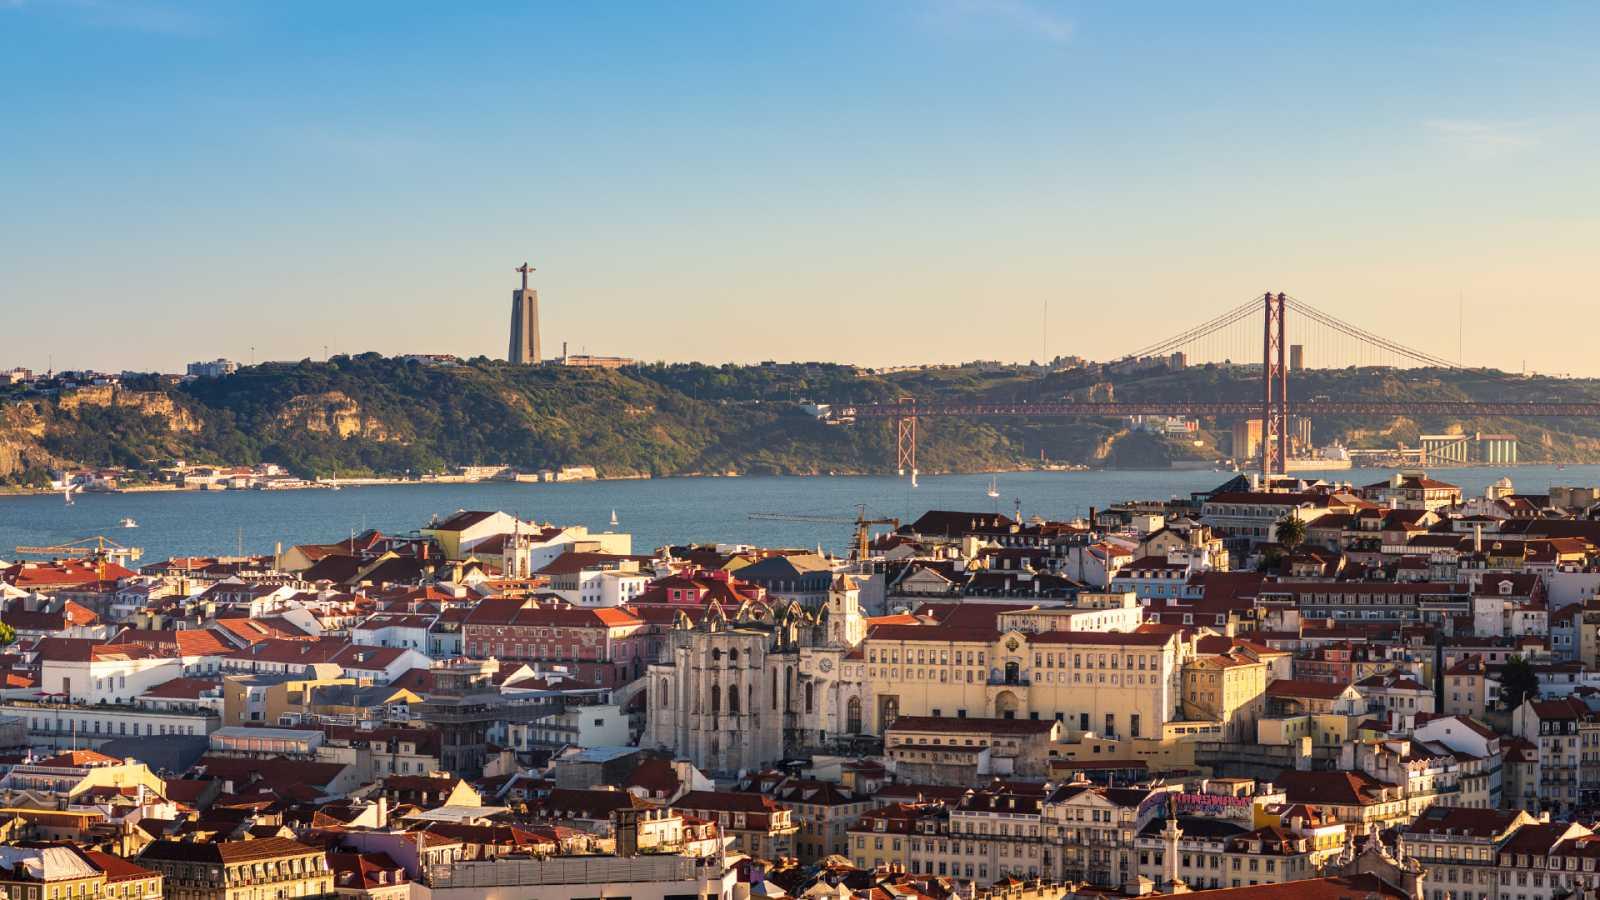 Canal Europa - Anécdotas del Tratado de Lisboa - 18/08/20 - Escuchar ahora